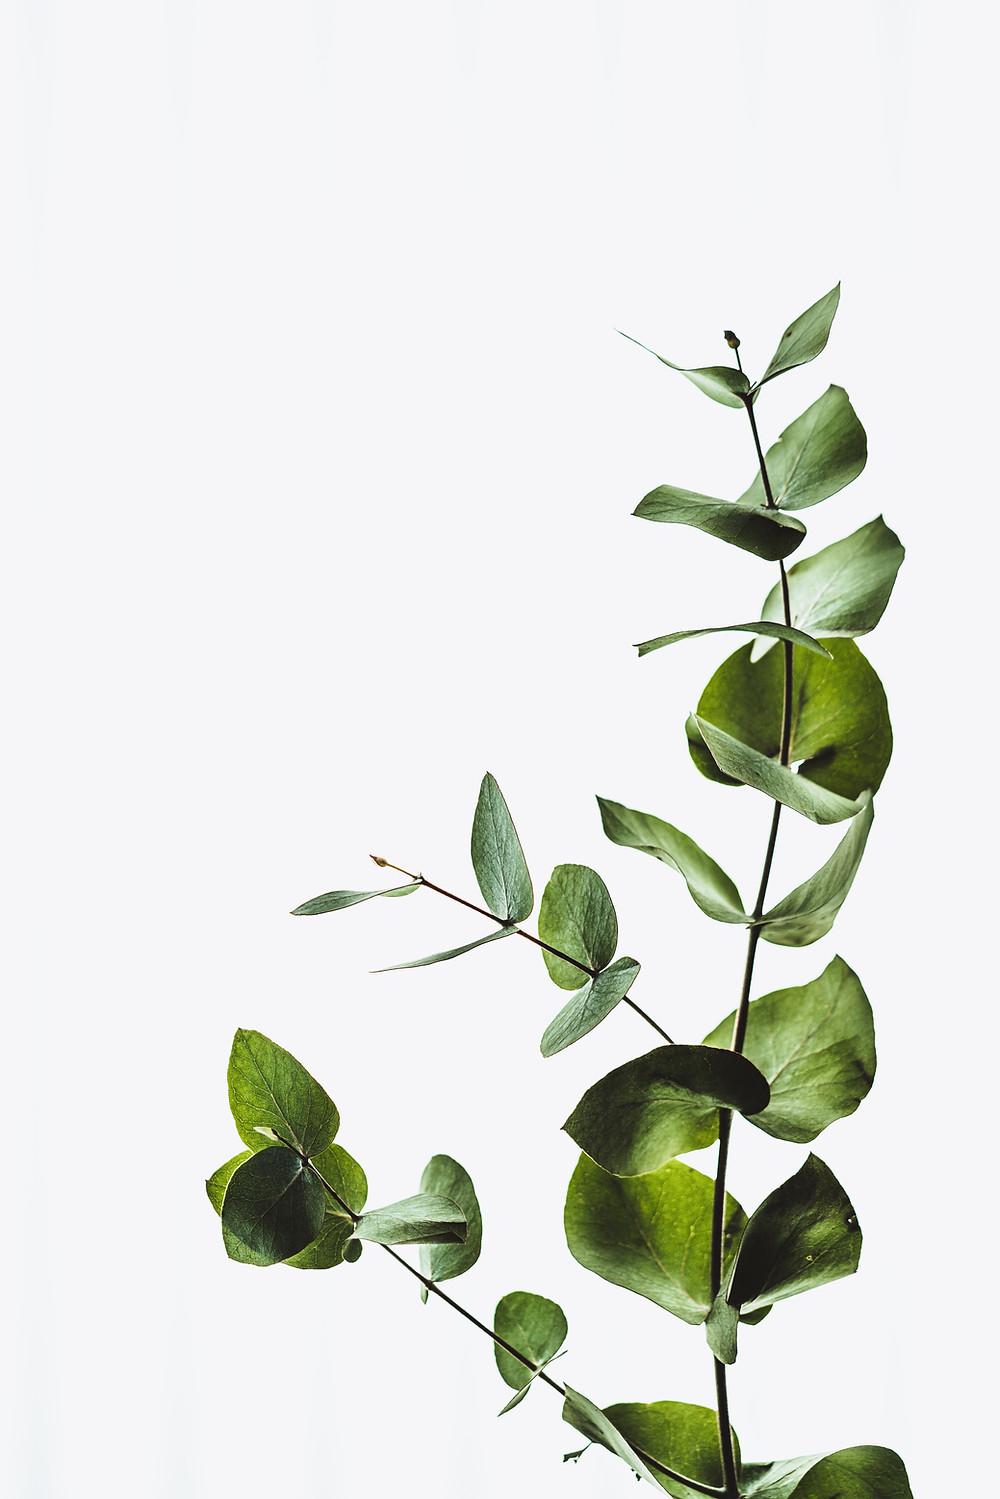 eucalyptol terpenes in eucalyptus